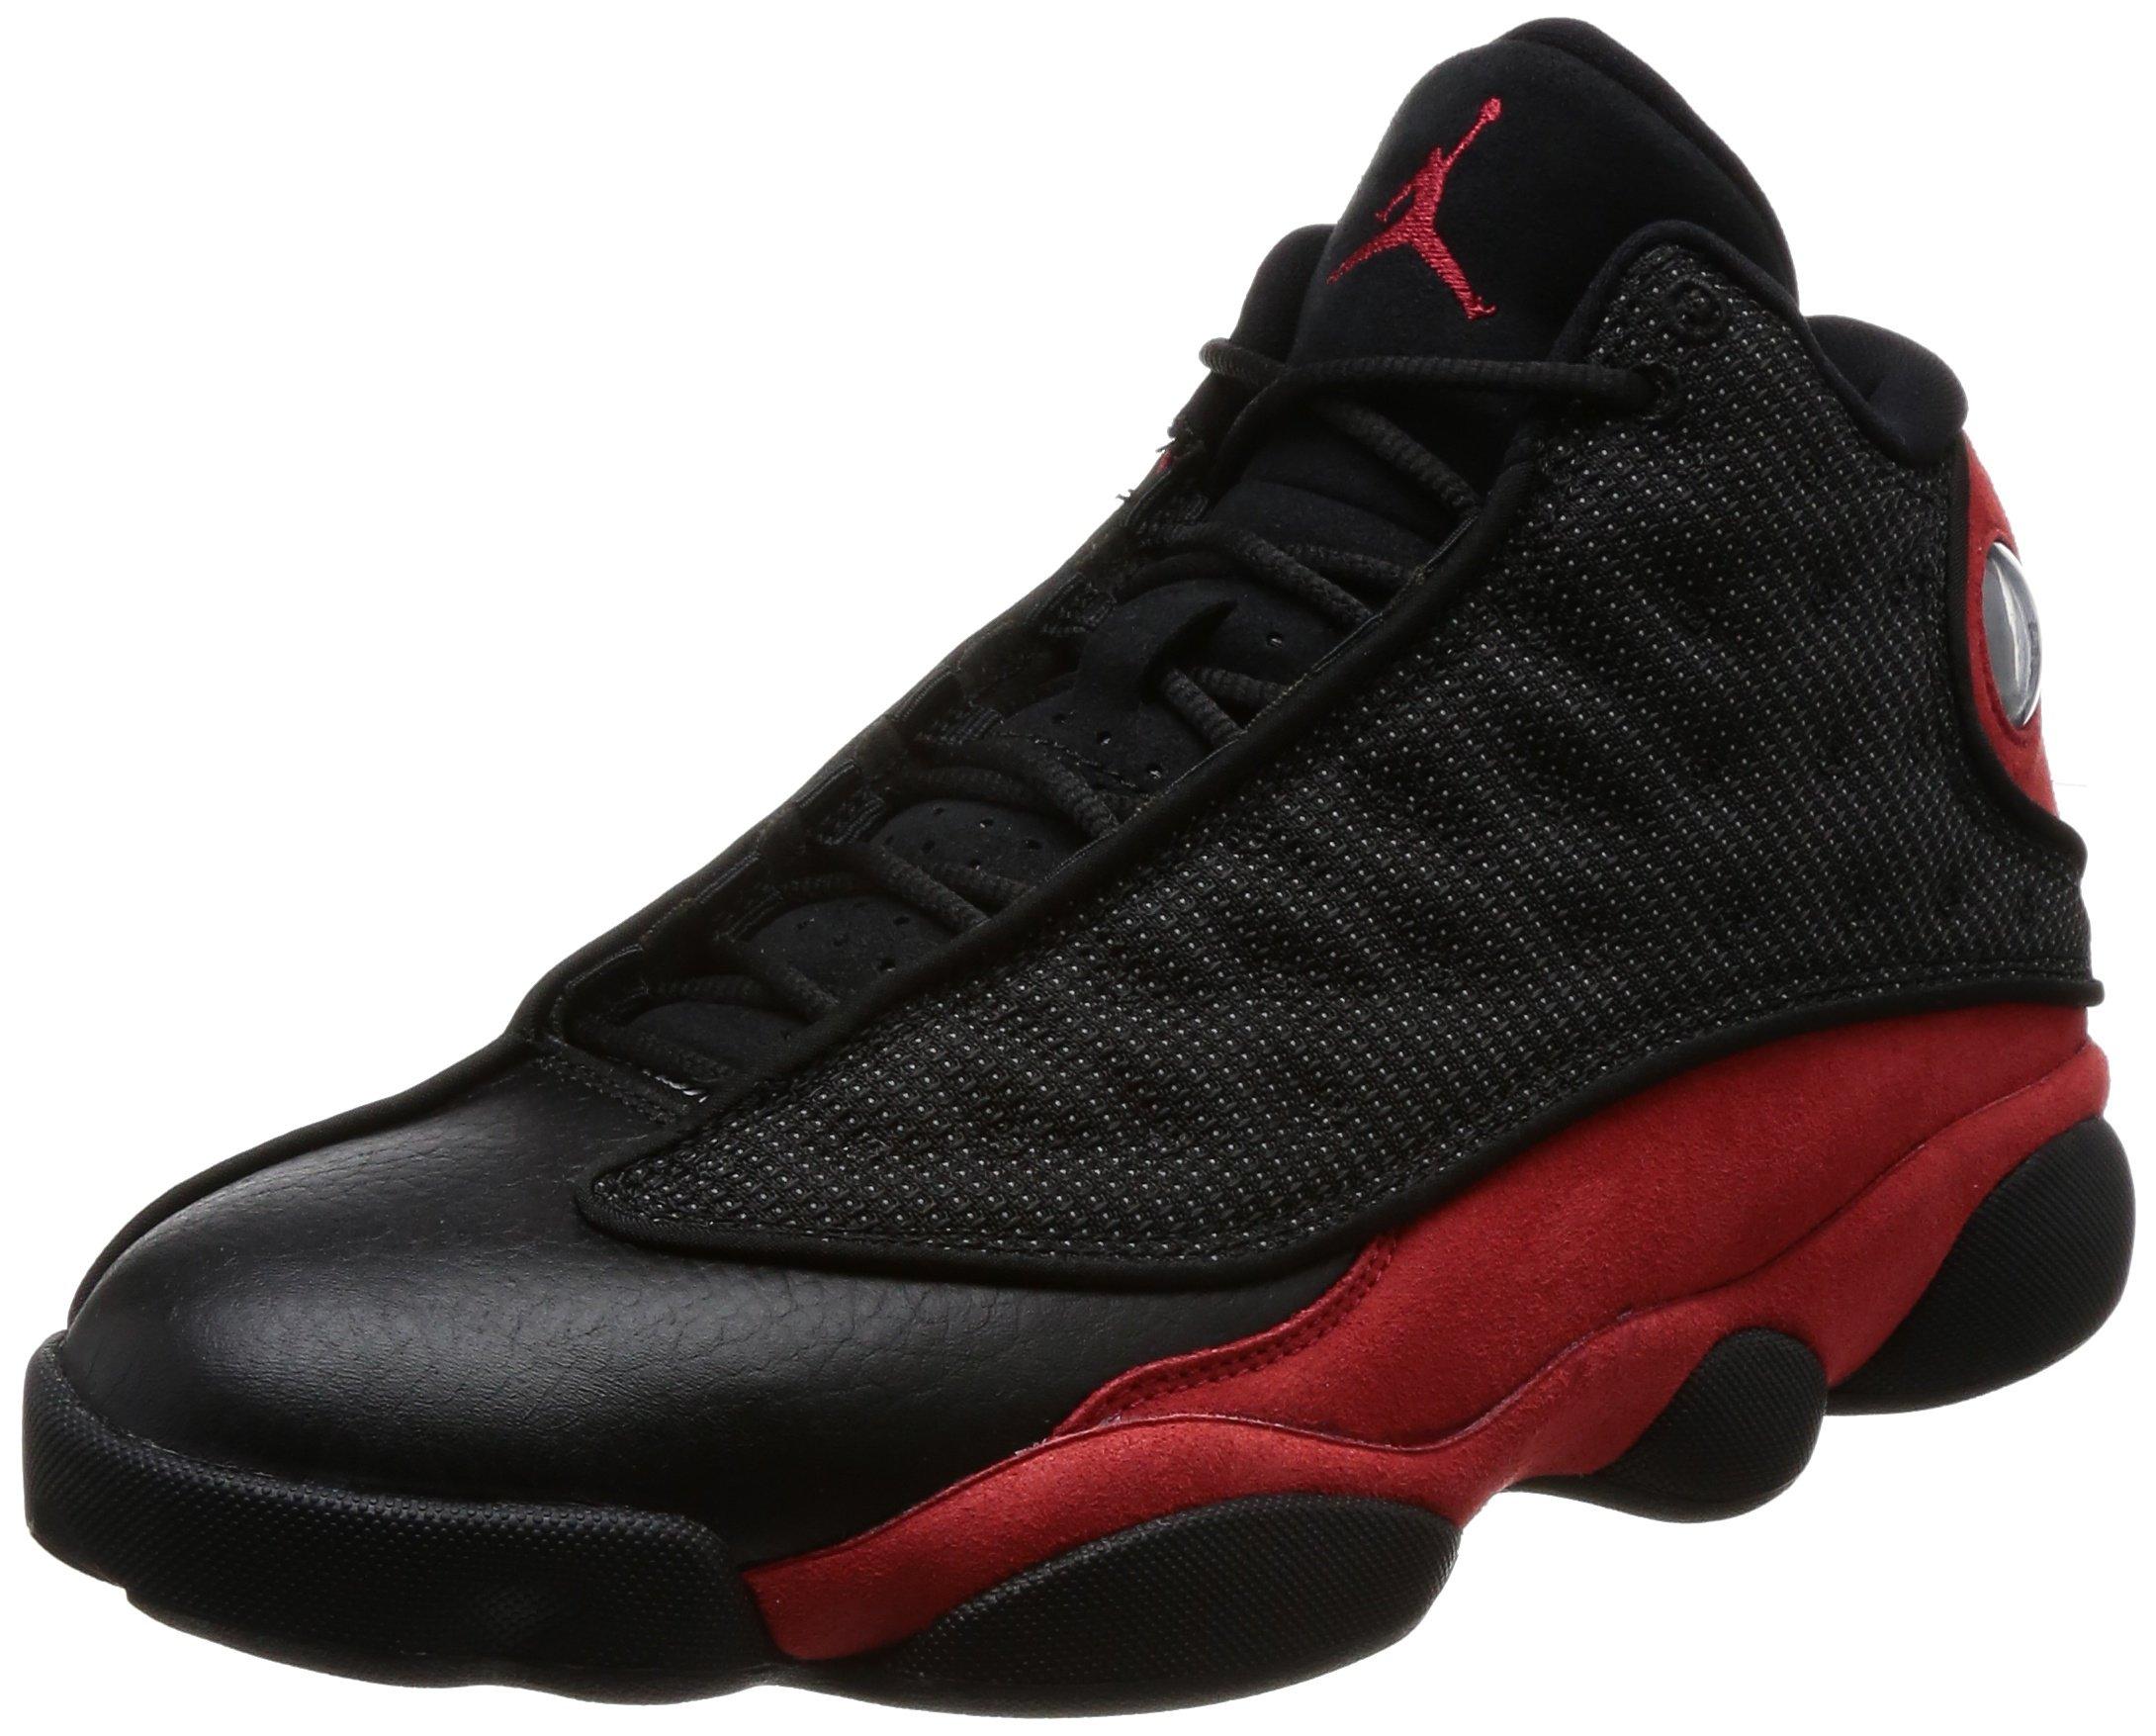 buy online 8d67f 01ade Galleon - Nike Air Jordan 13 Retro 414571-004 BRED Black White True Red  Men s Basketball Shoes (10.5)